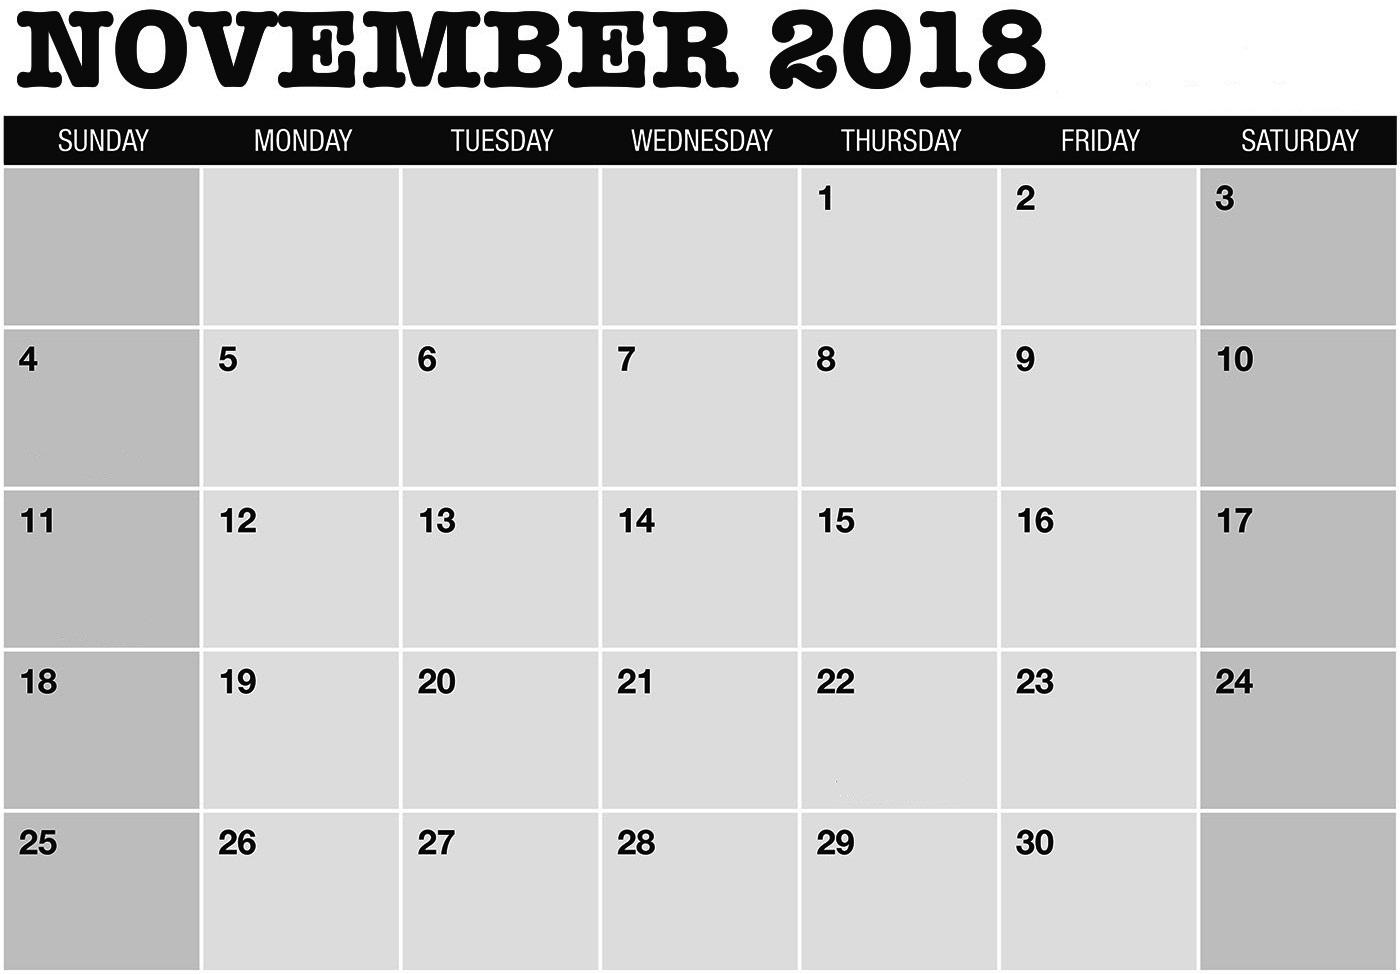 free 2018 november calendar a4 printable template december 2018::November 2018 Calendar